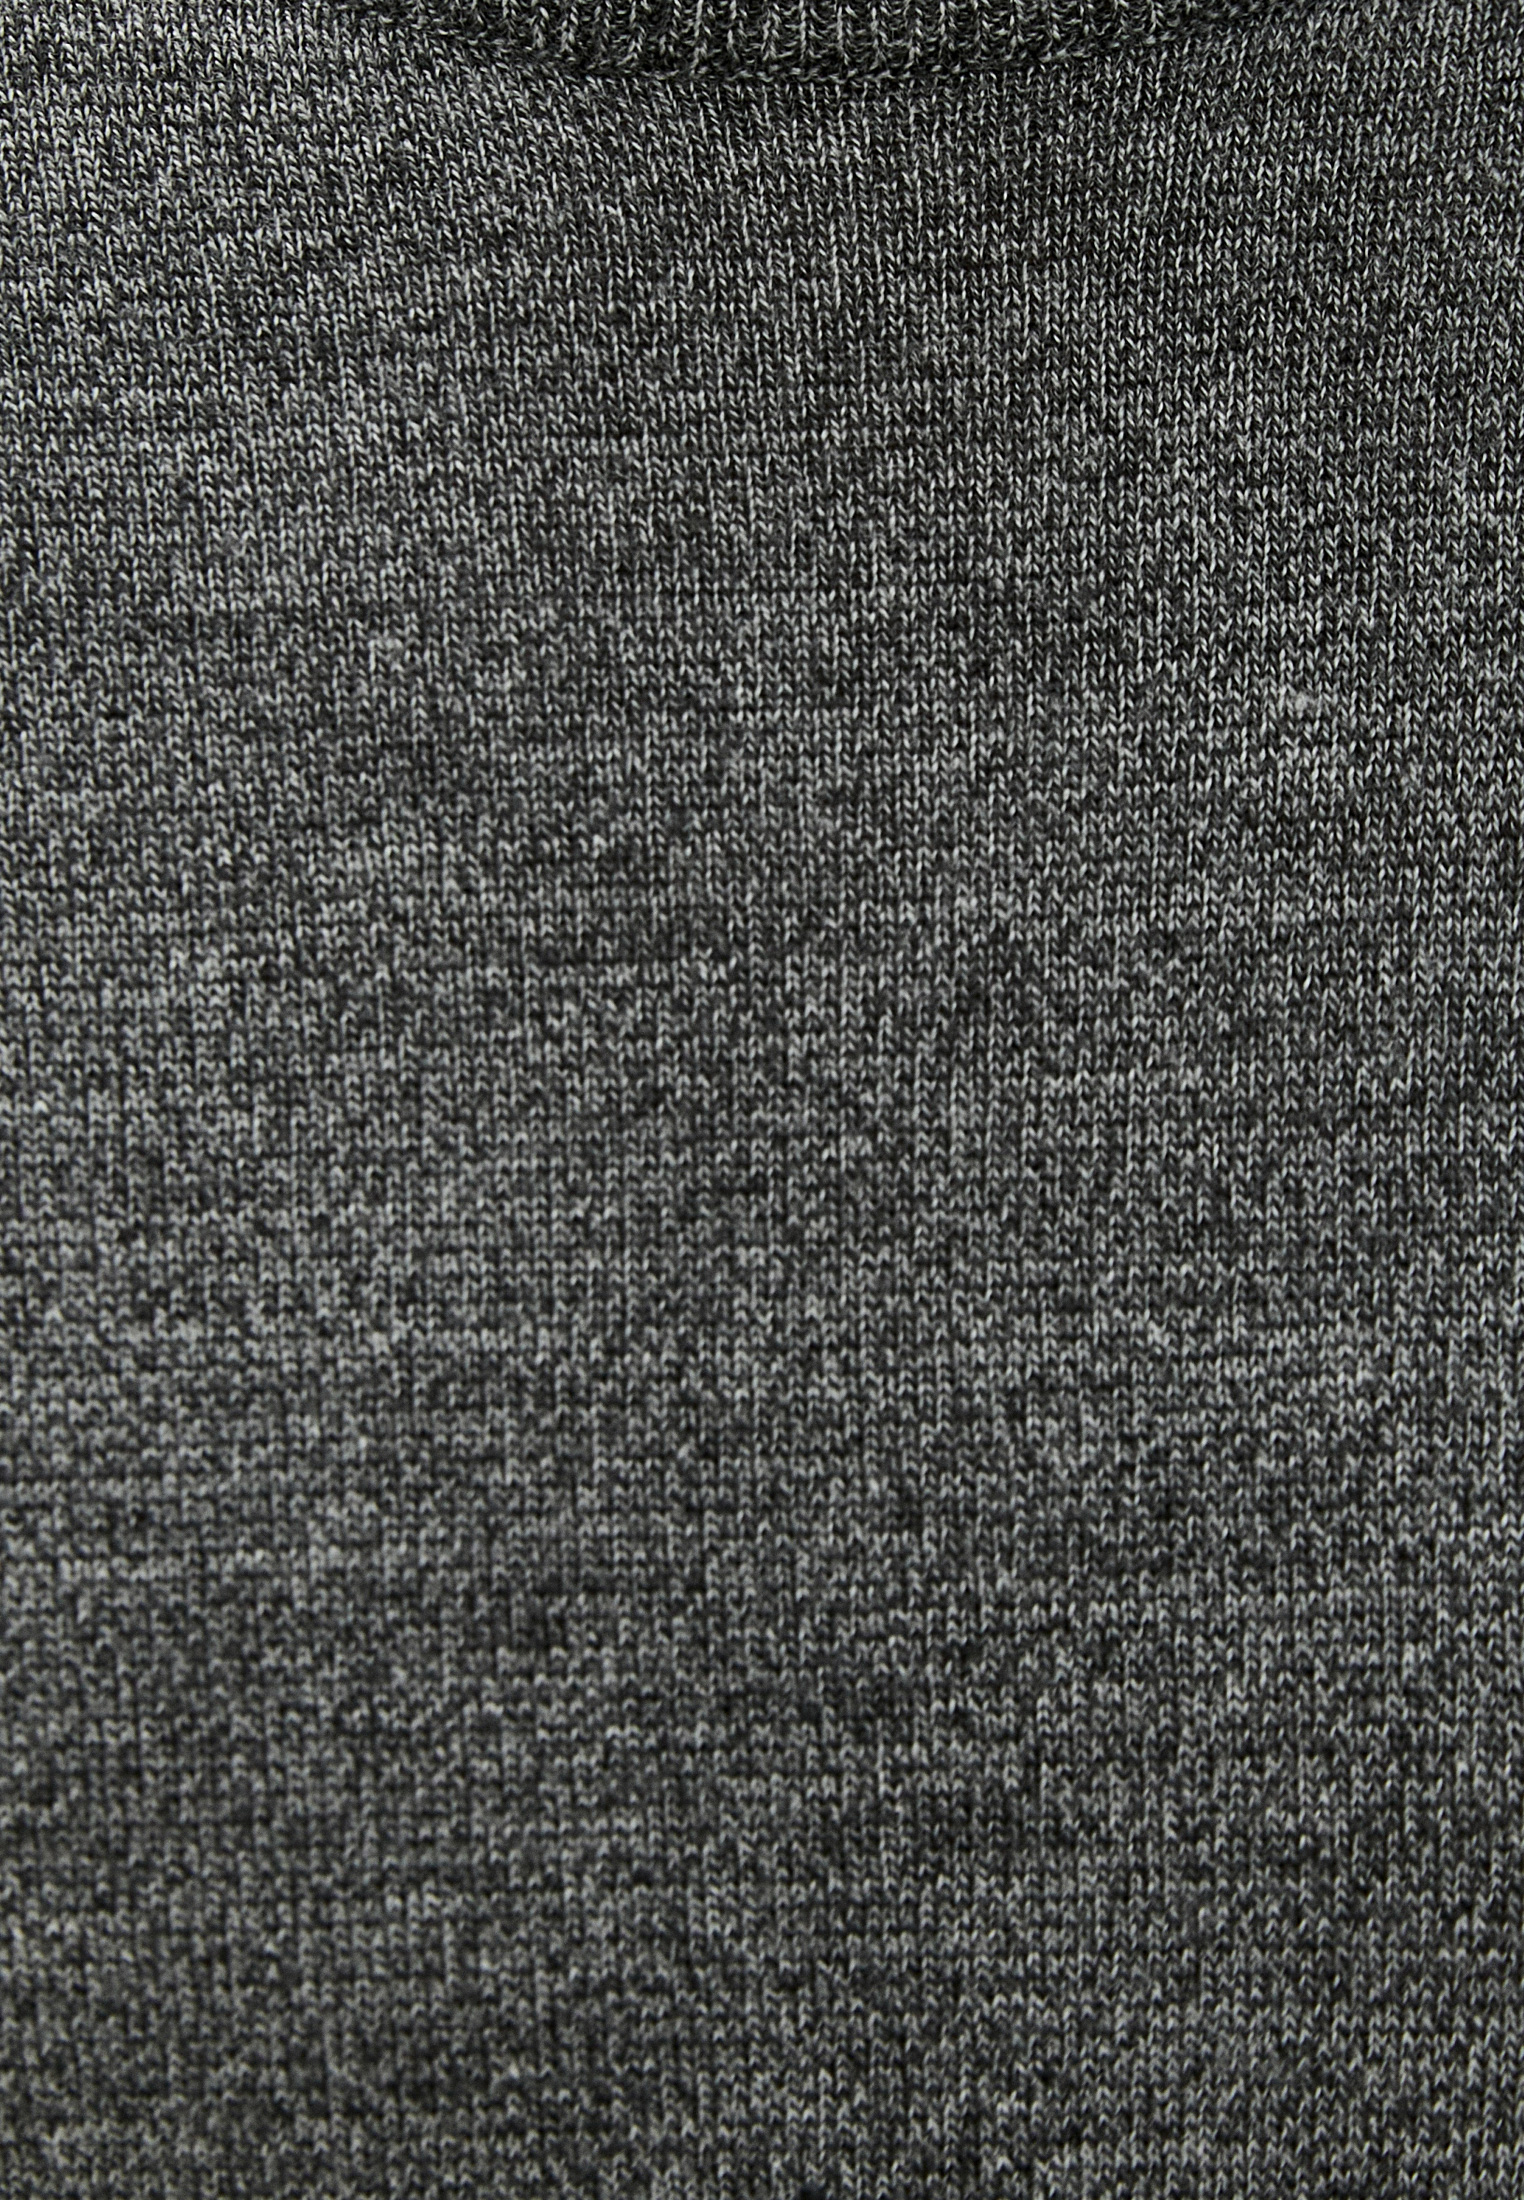 Водолазка Bikkembergs (Биккембергс) C S D34 10 X 1148: изображение 5